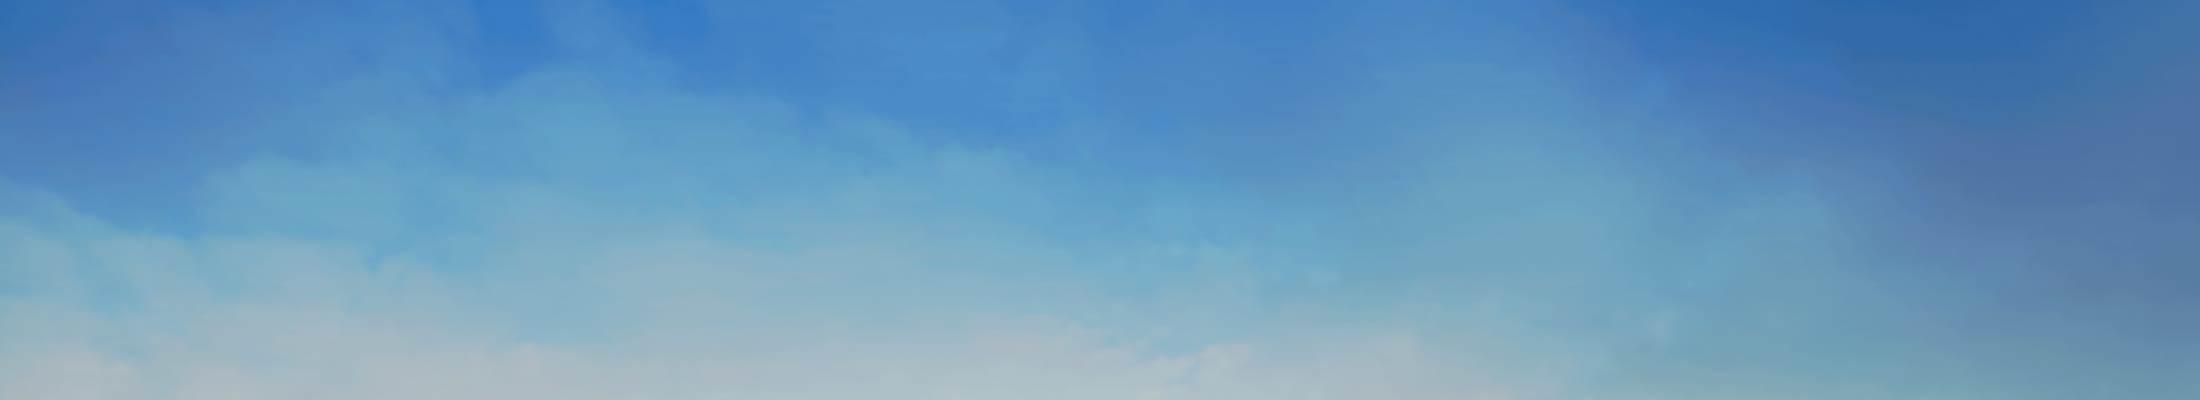 Home page slider sky